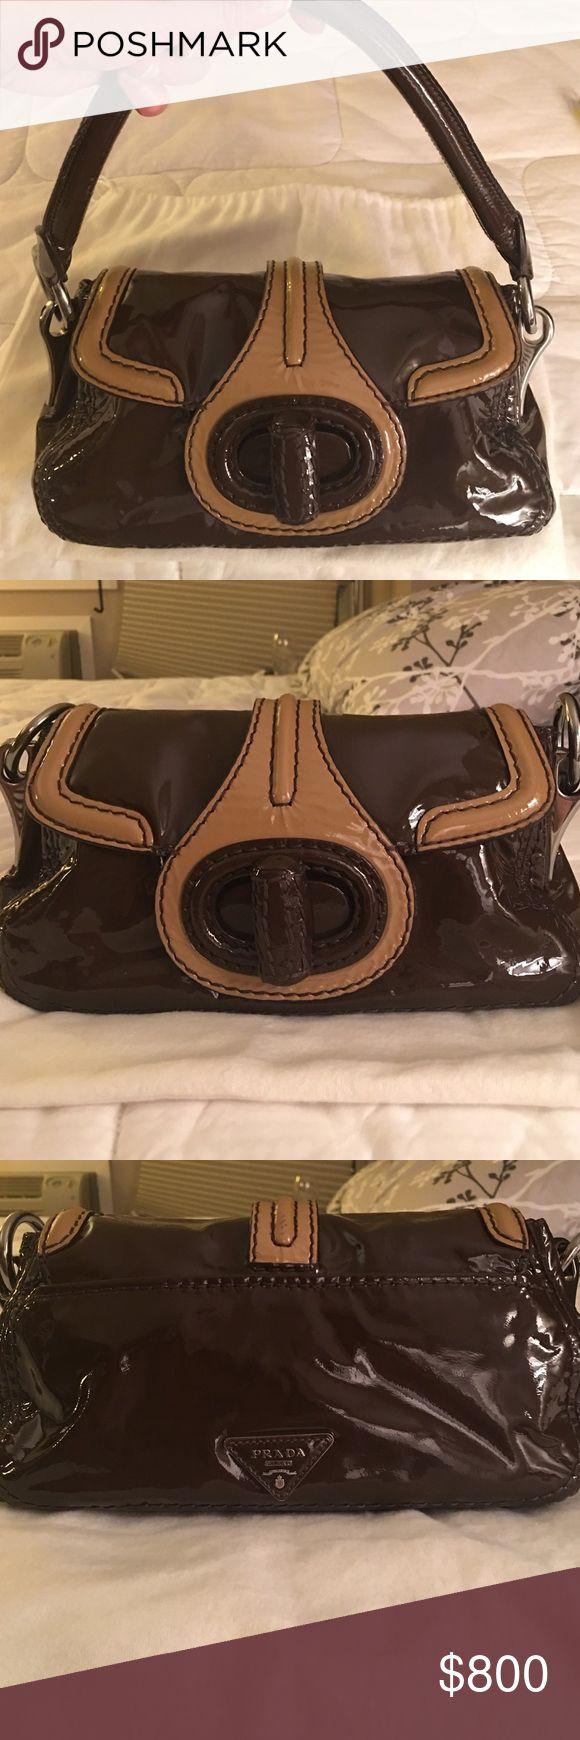 Selling this Prada handbag on Poshmark! My username is: michellelin1. #shopmycloset #poshmark #fashion #shopping #style #forsale #Prada #Handbags